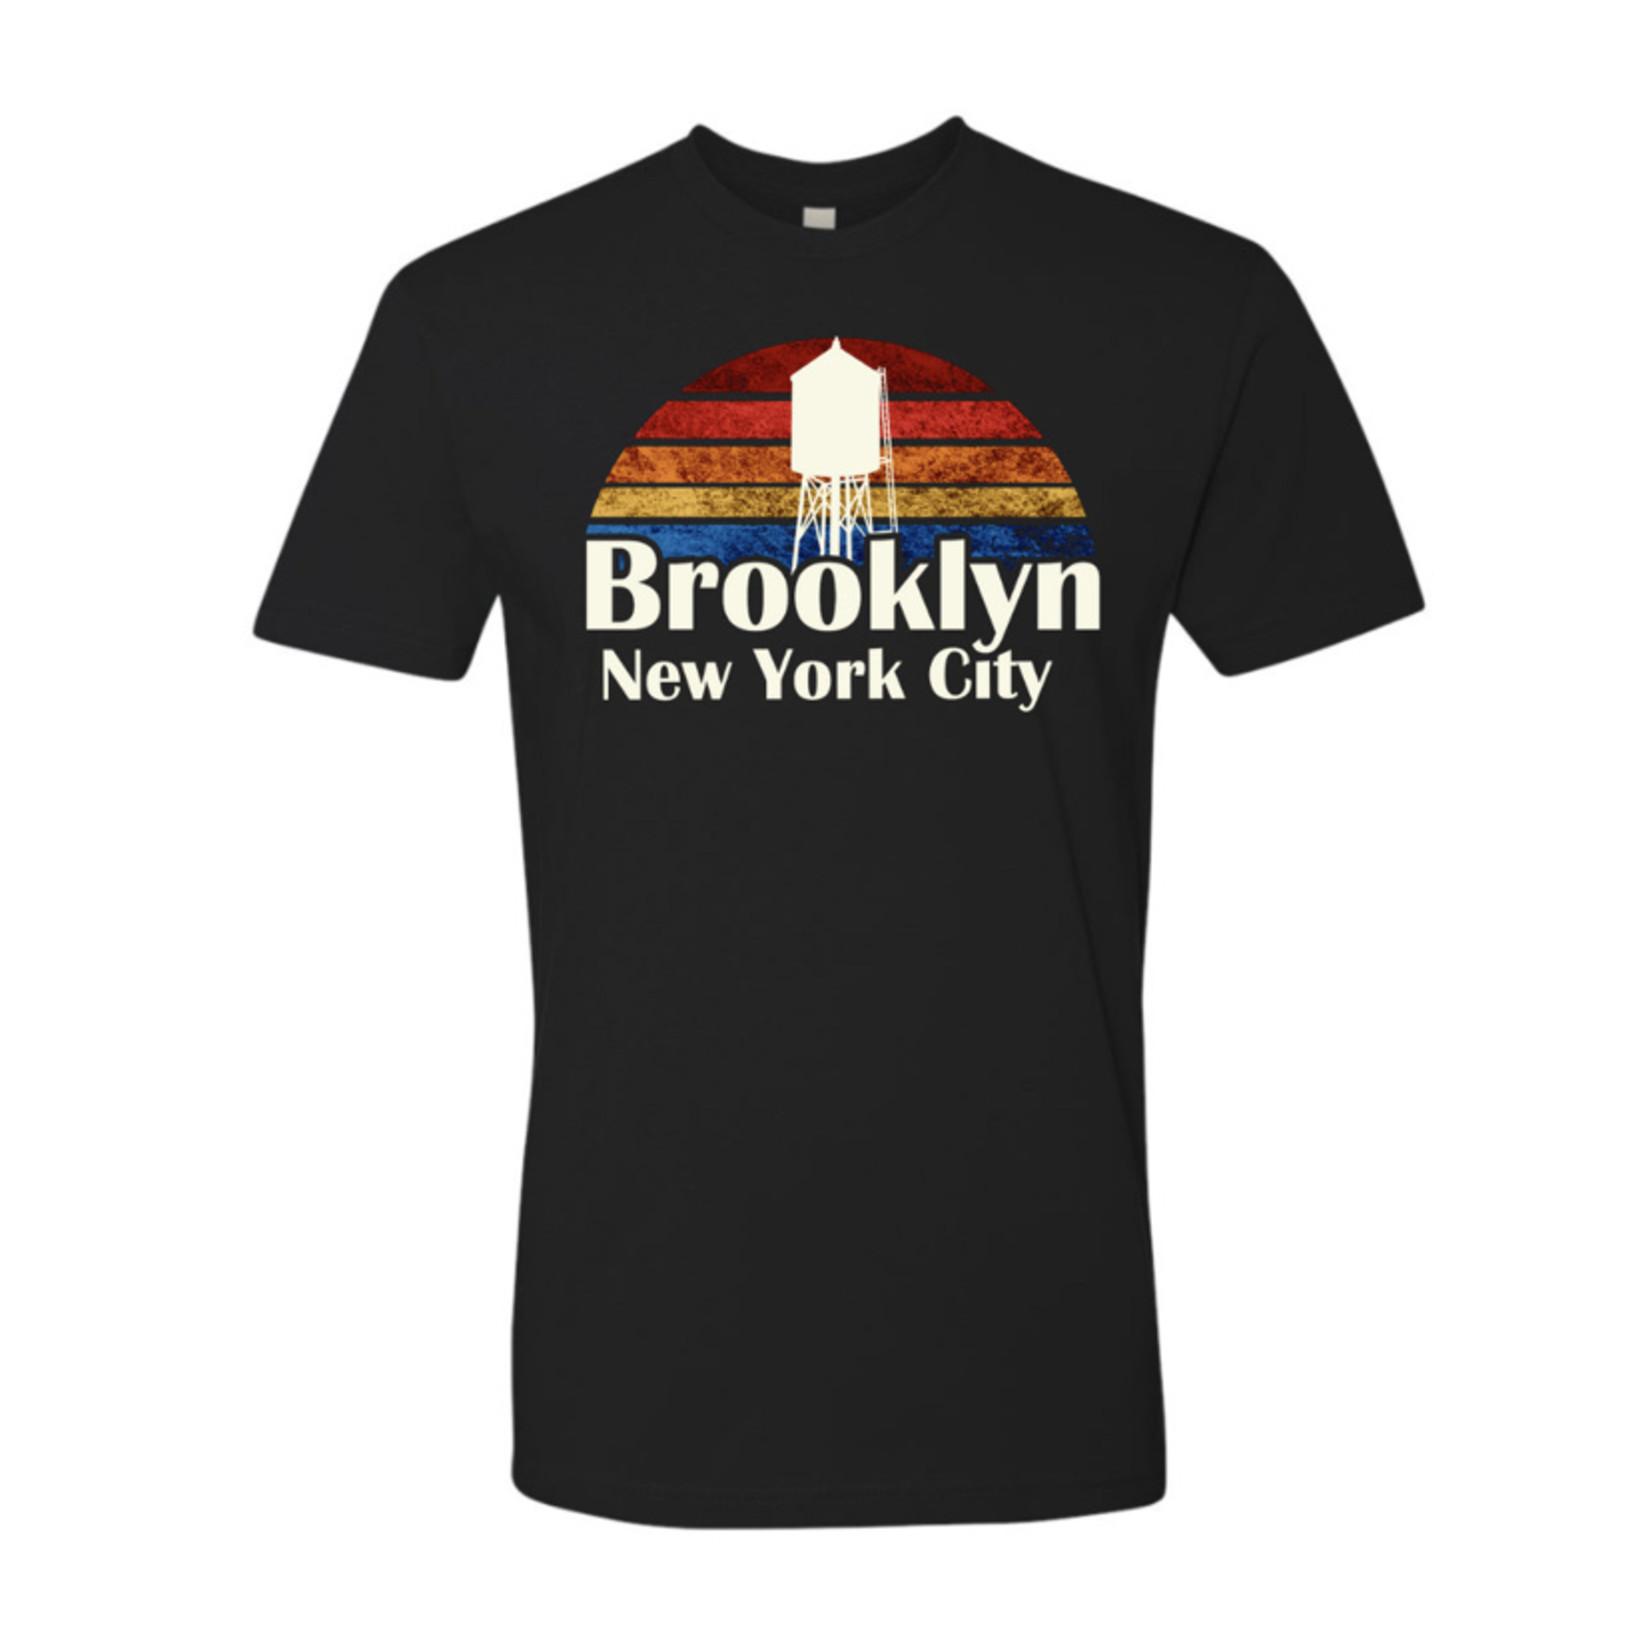 Brooklyn Watertower T-Shirt